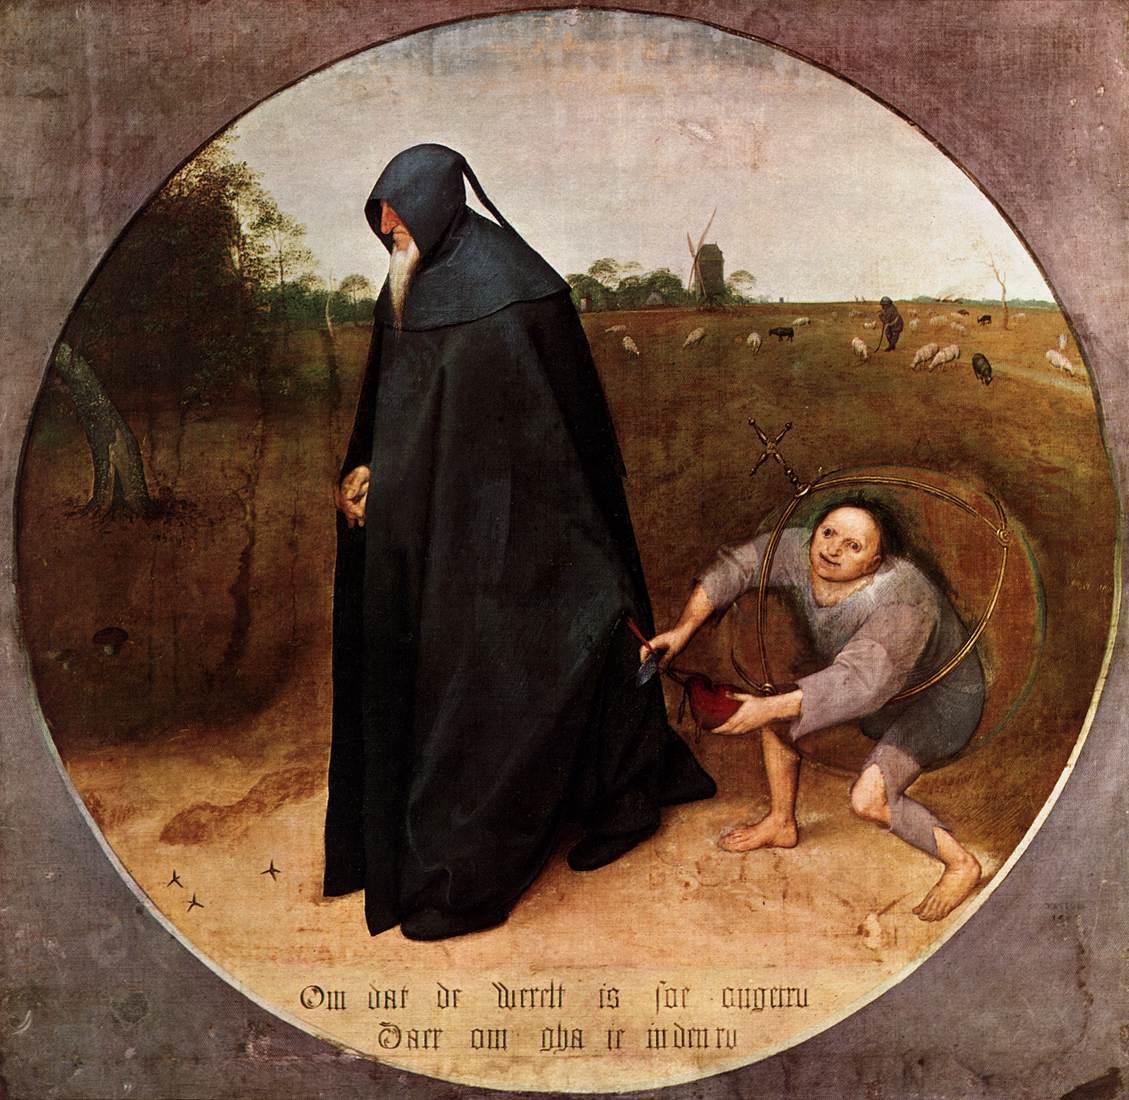 The Misanthrope, 1568